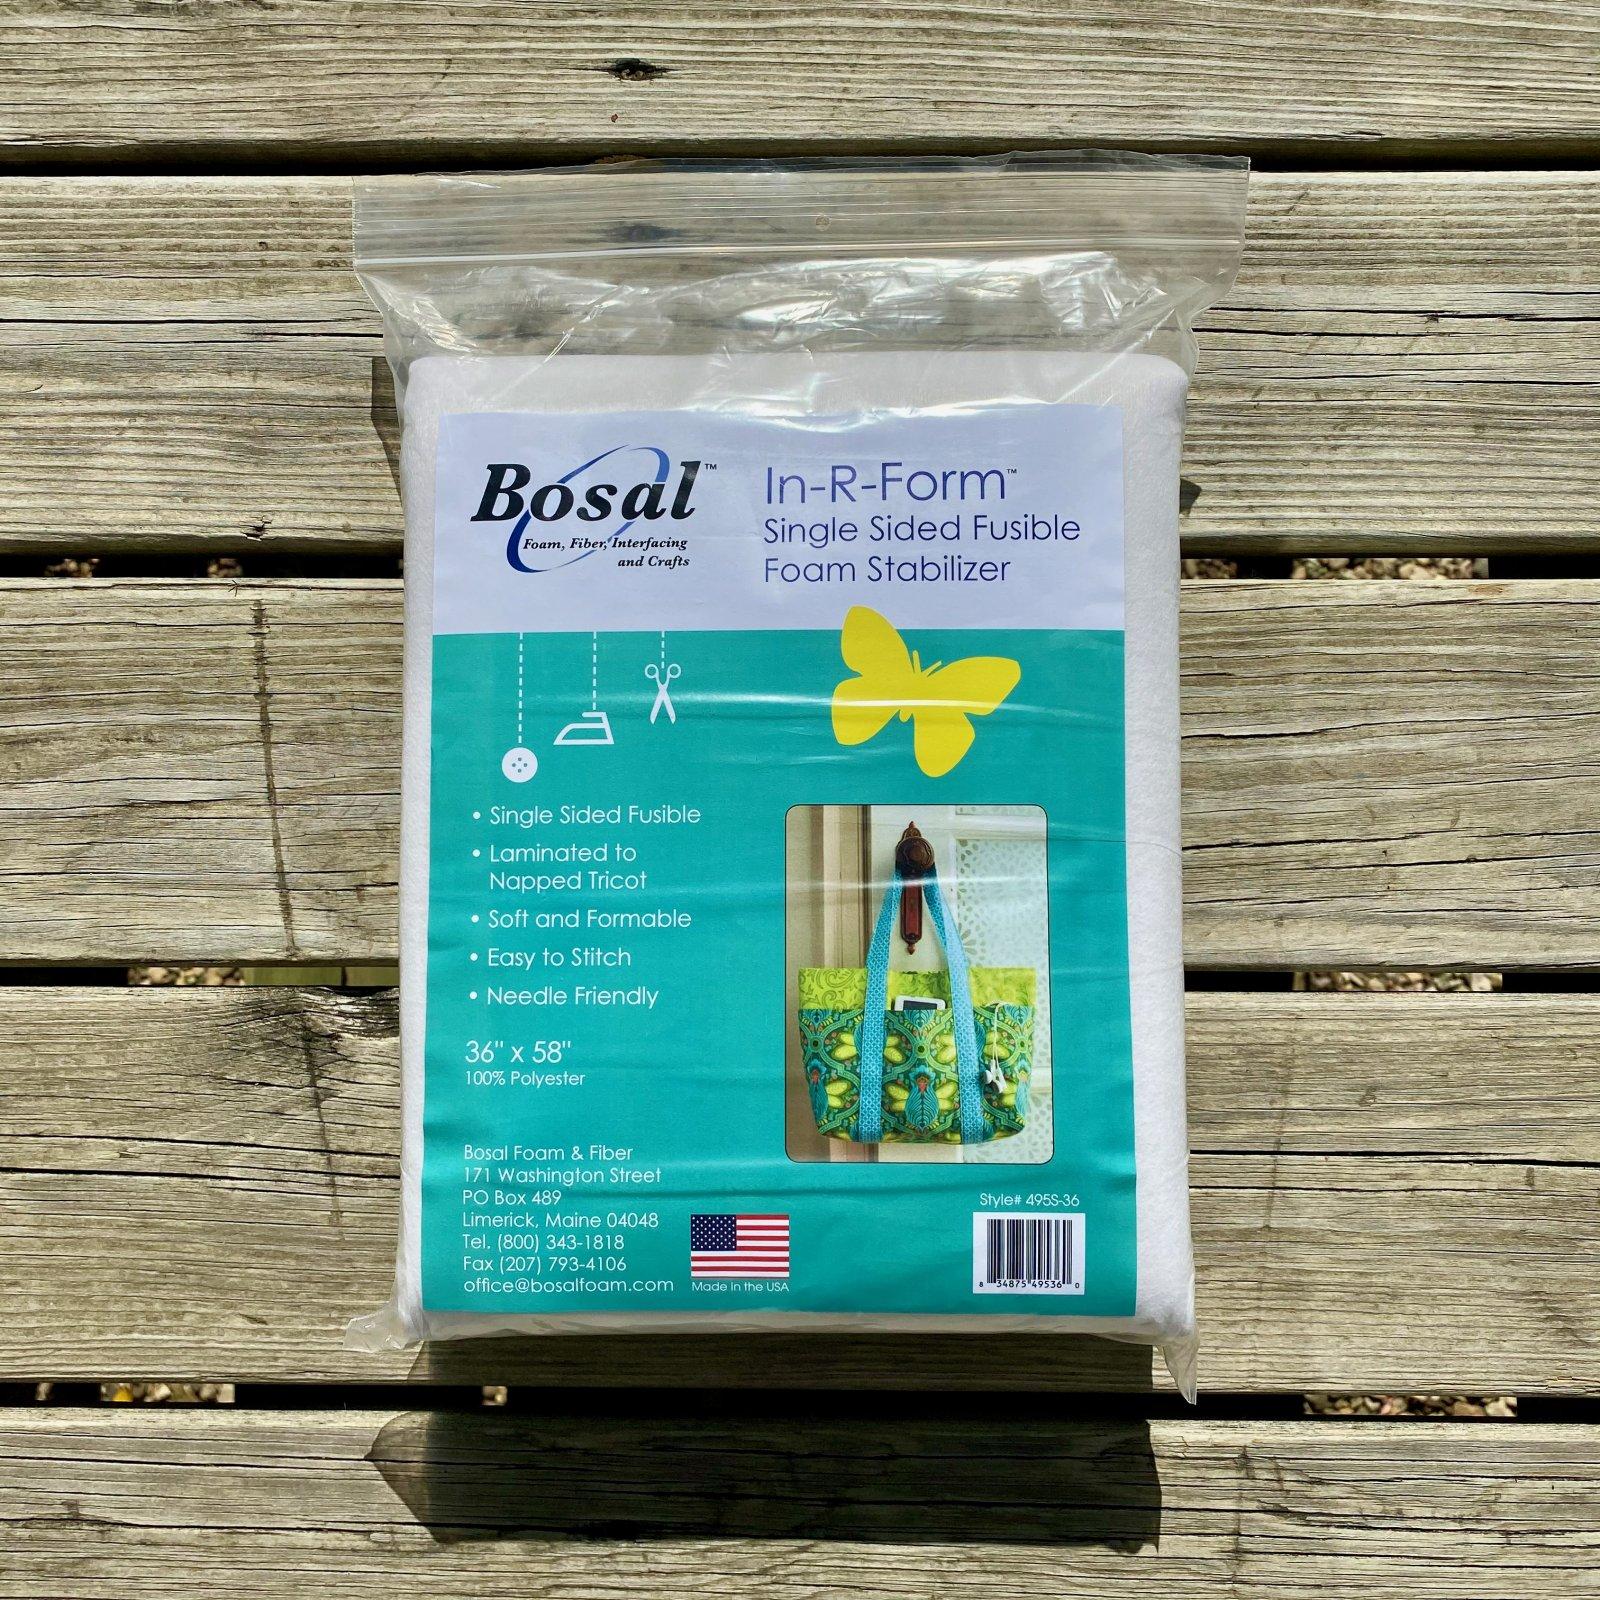 Bosal In-R-Form Plus Single Sided Fusible Foam Stabilizer (1 yd pack)